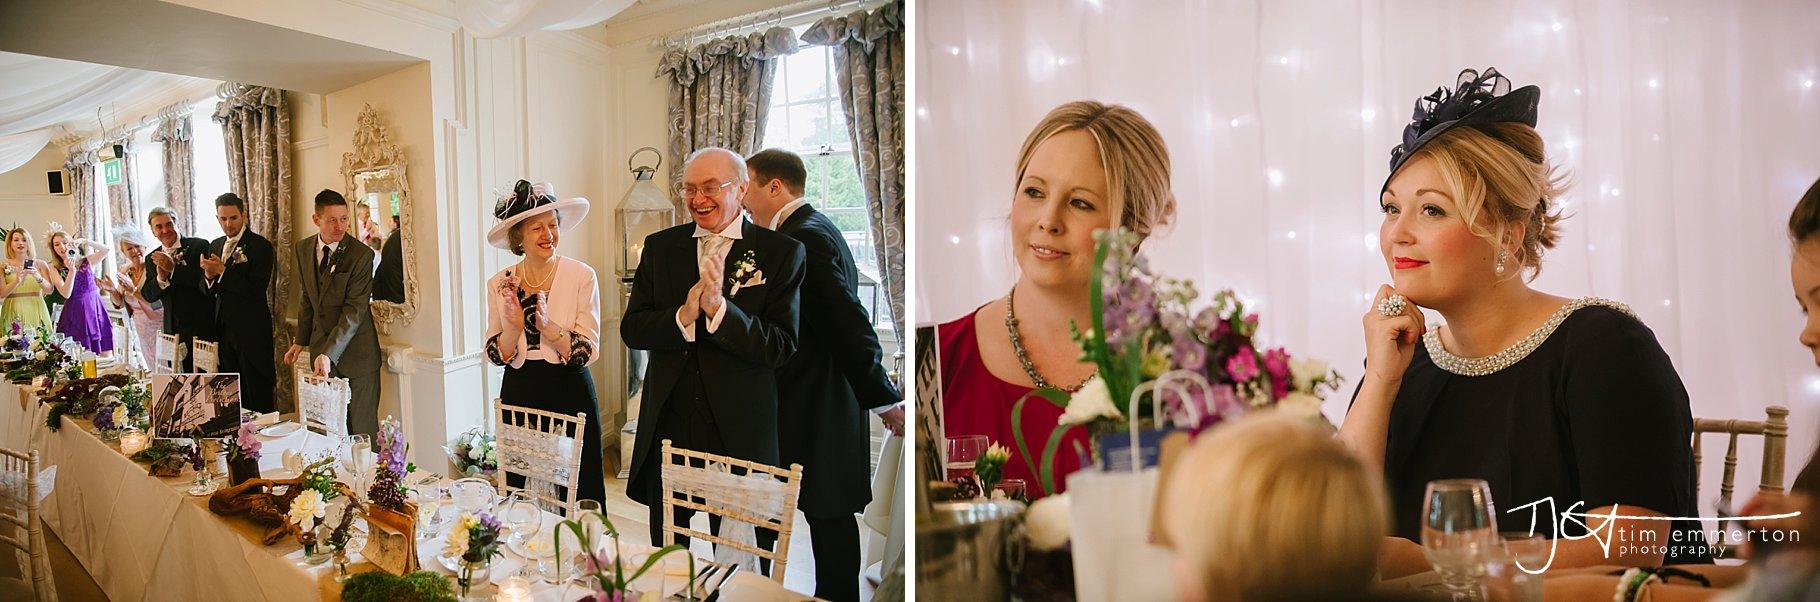 Eaves-Hall-Wedding-Photographer-102.jpg